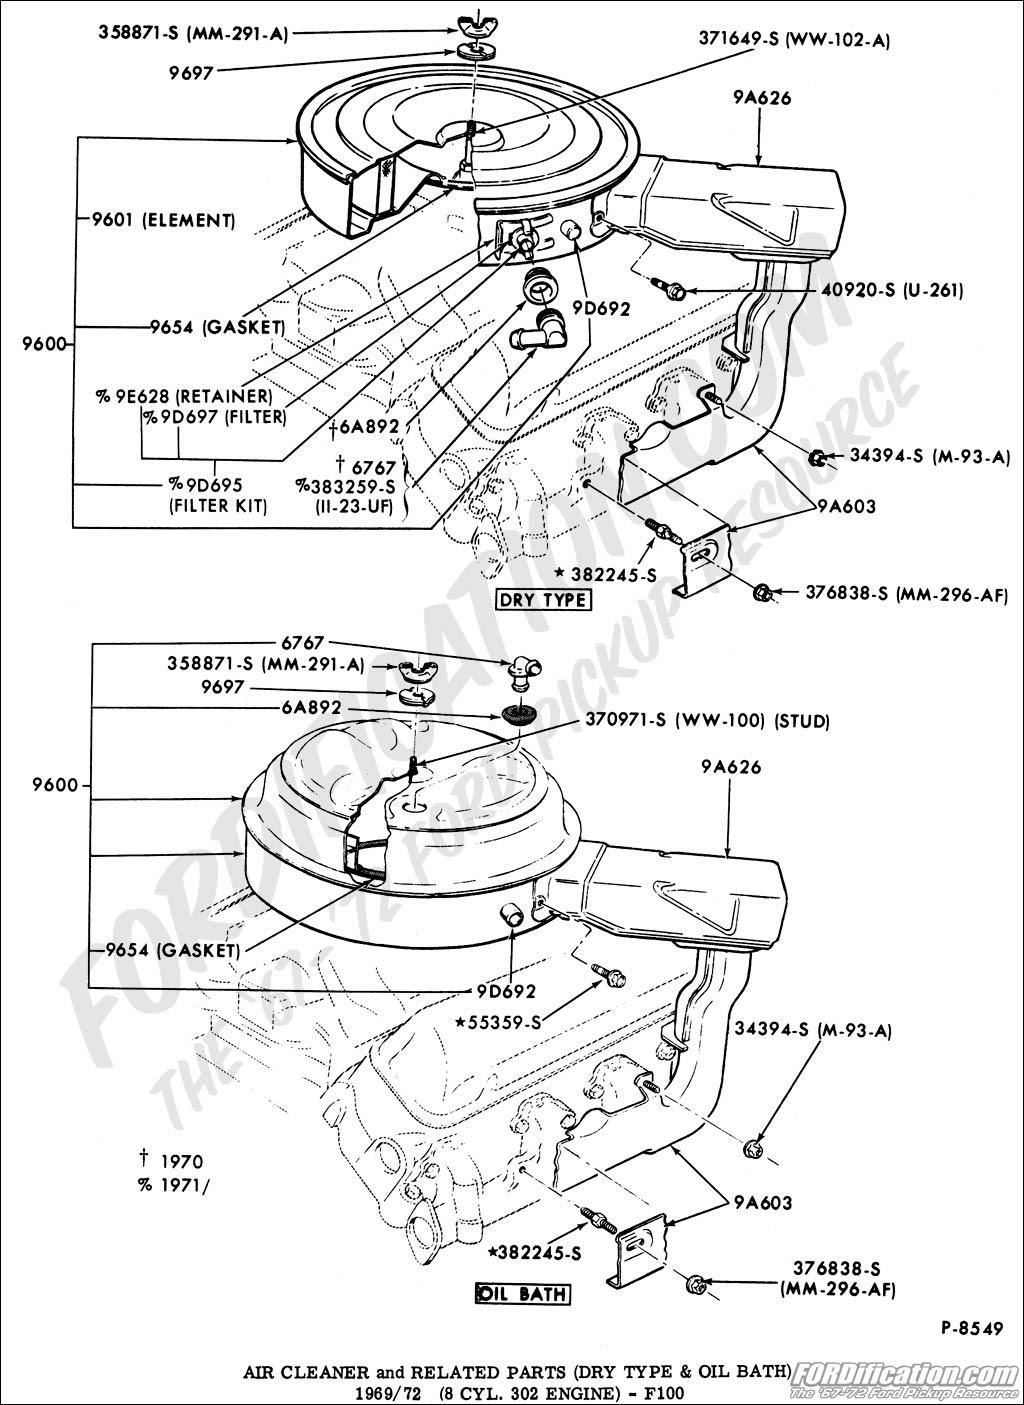 Diagram Wiring Diagram For 1975 Mustang Full Version Hd Quality 1975 Mustang Skematik110isi Gsdportotorres It